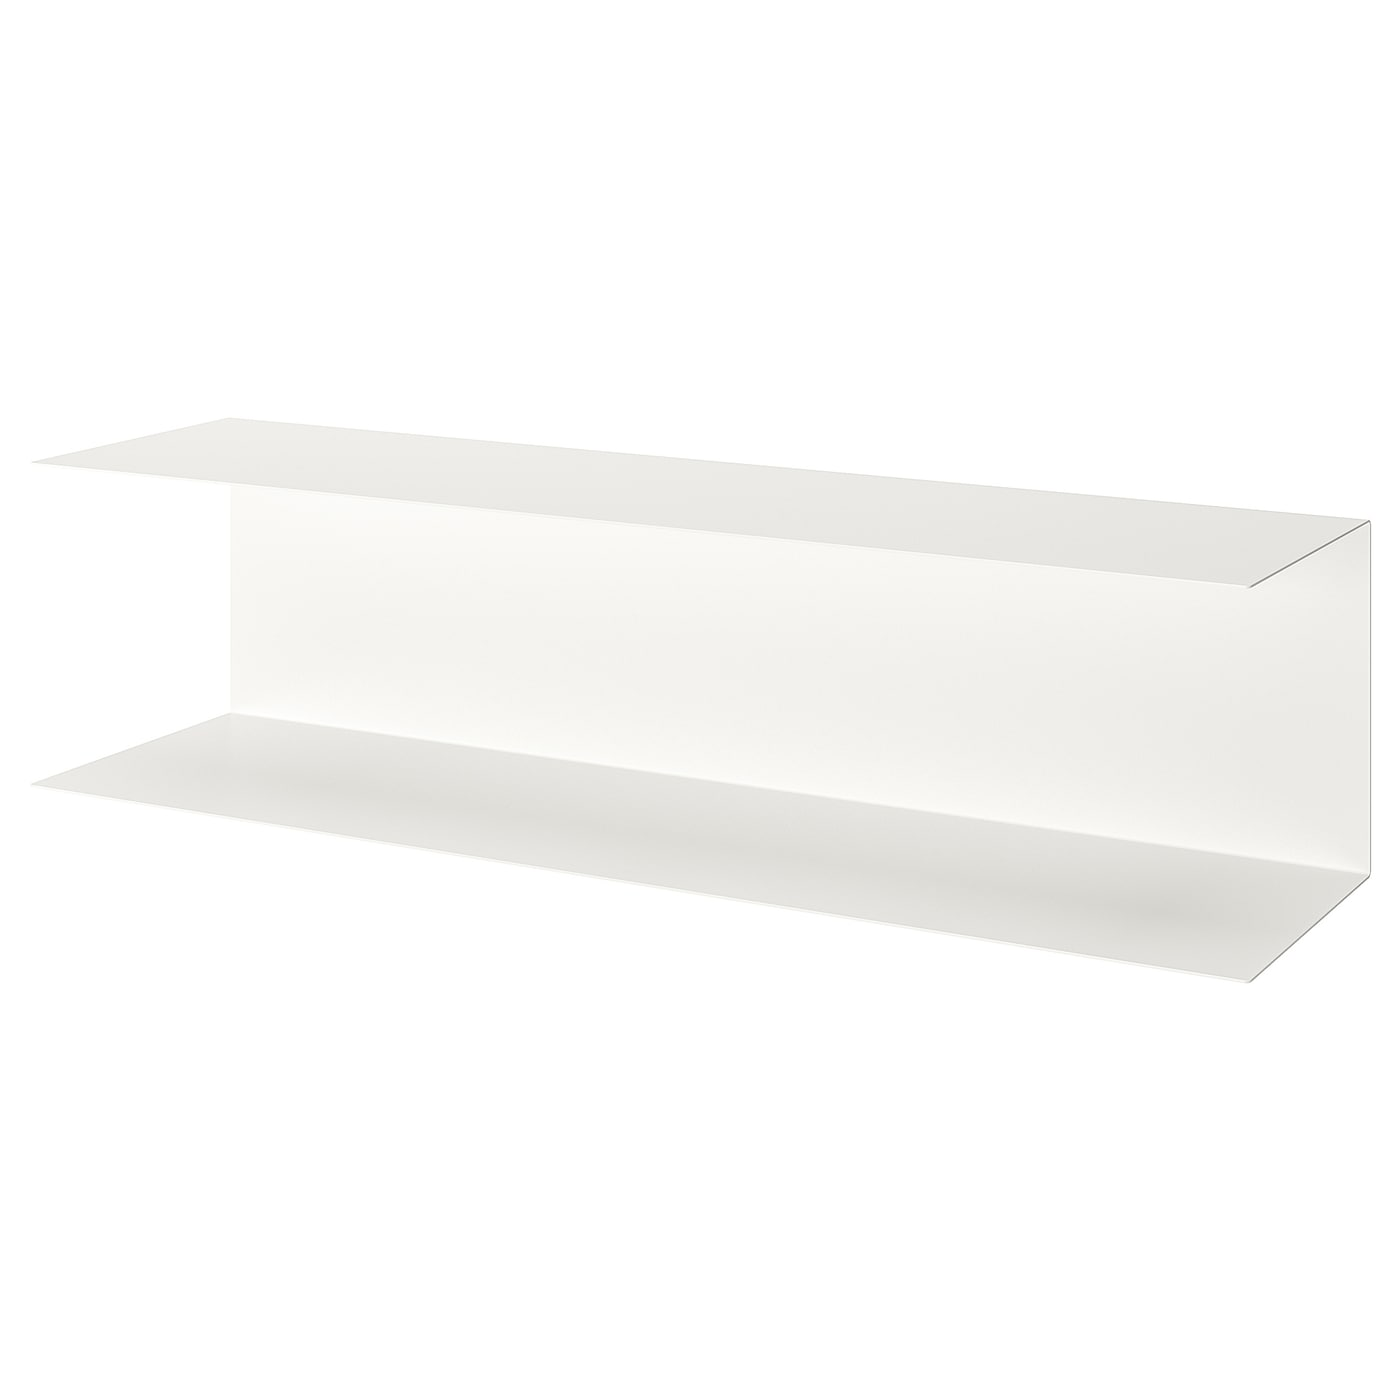 BOTKYRKA Wandregal - weiß 80x20 cm